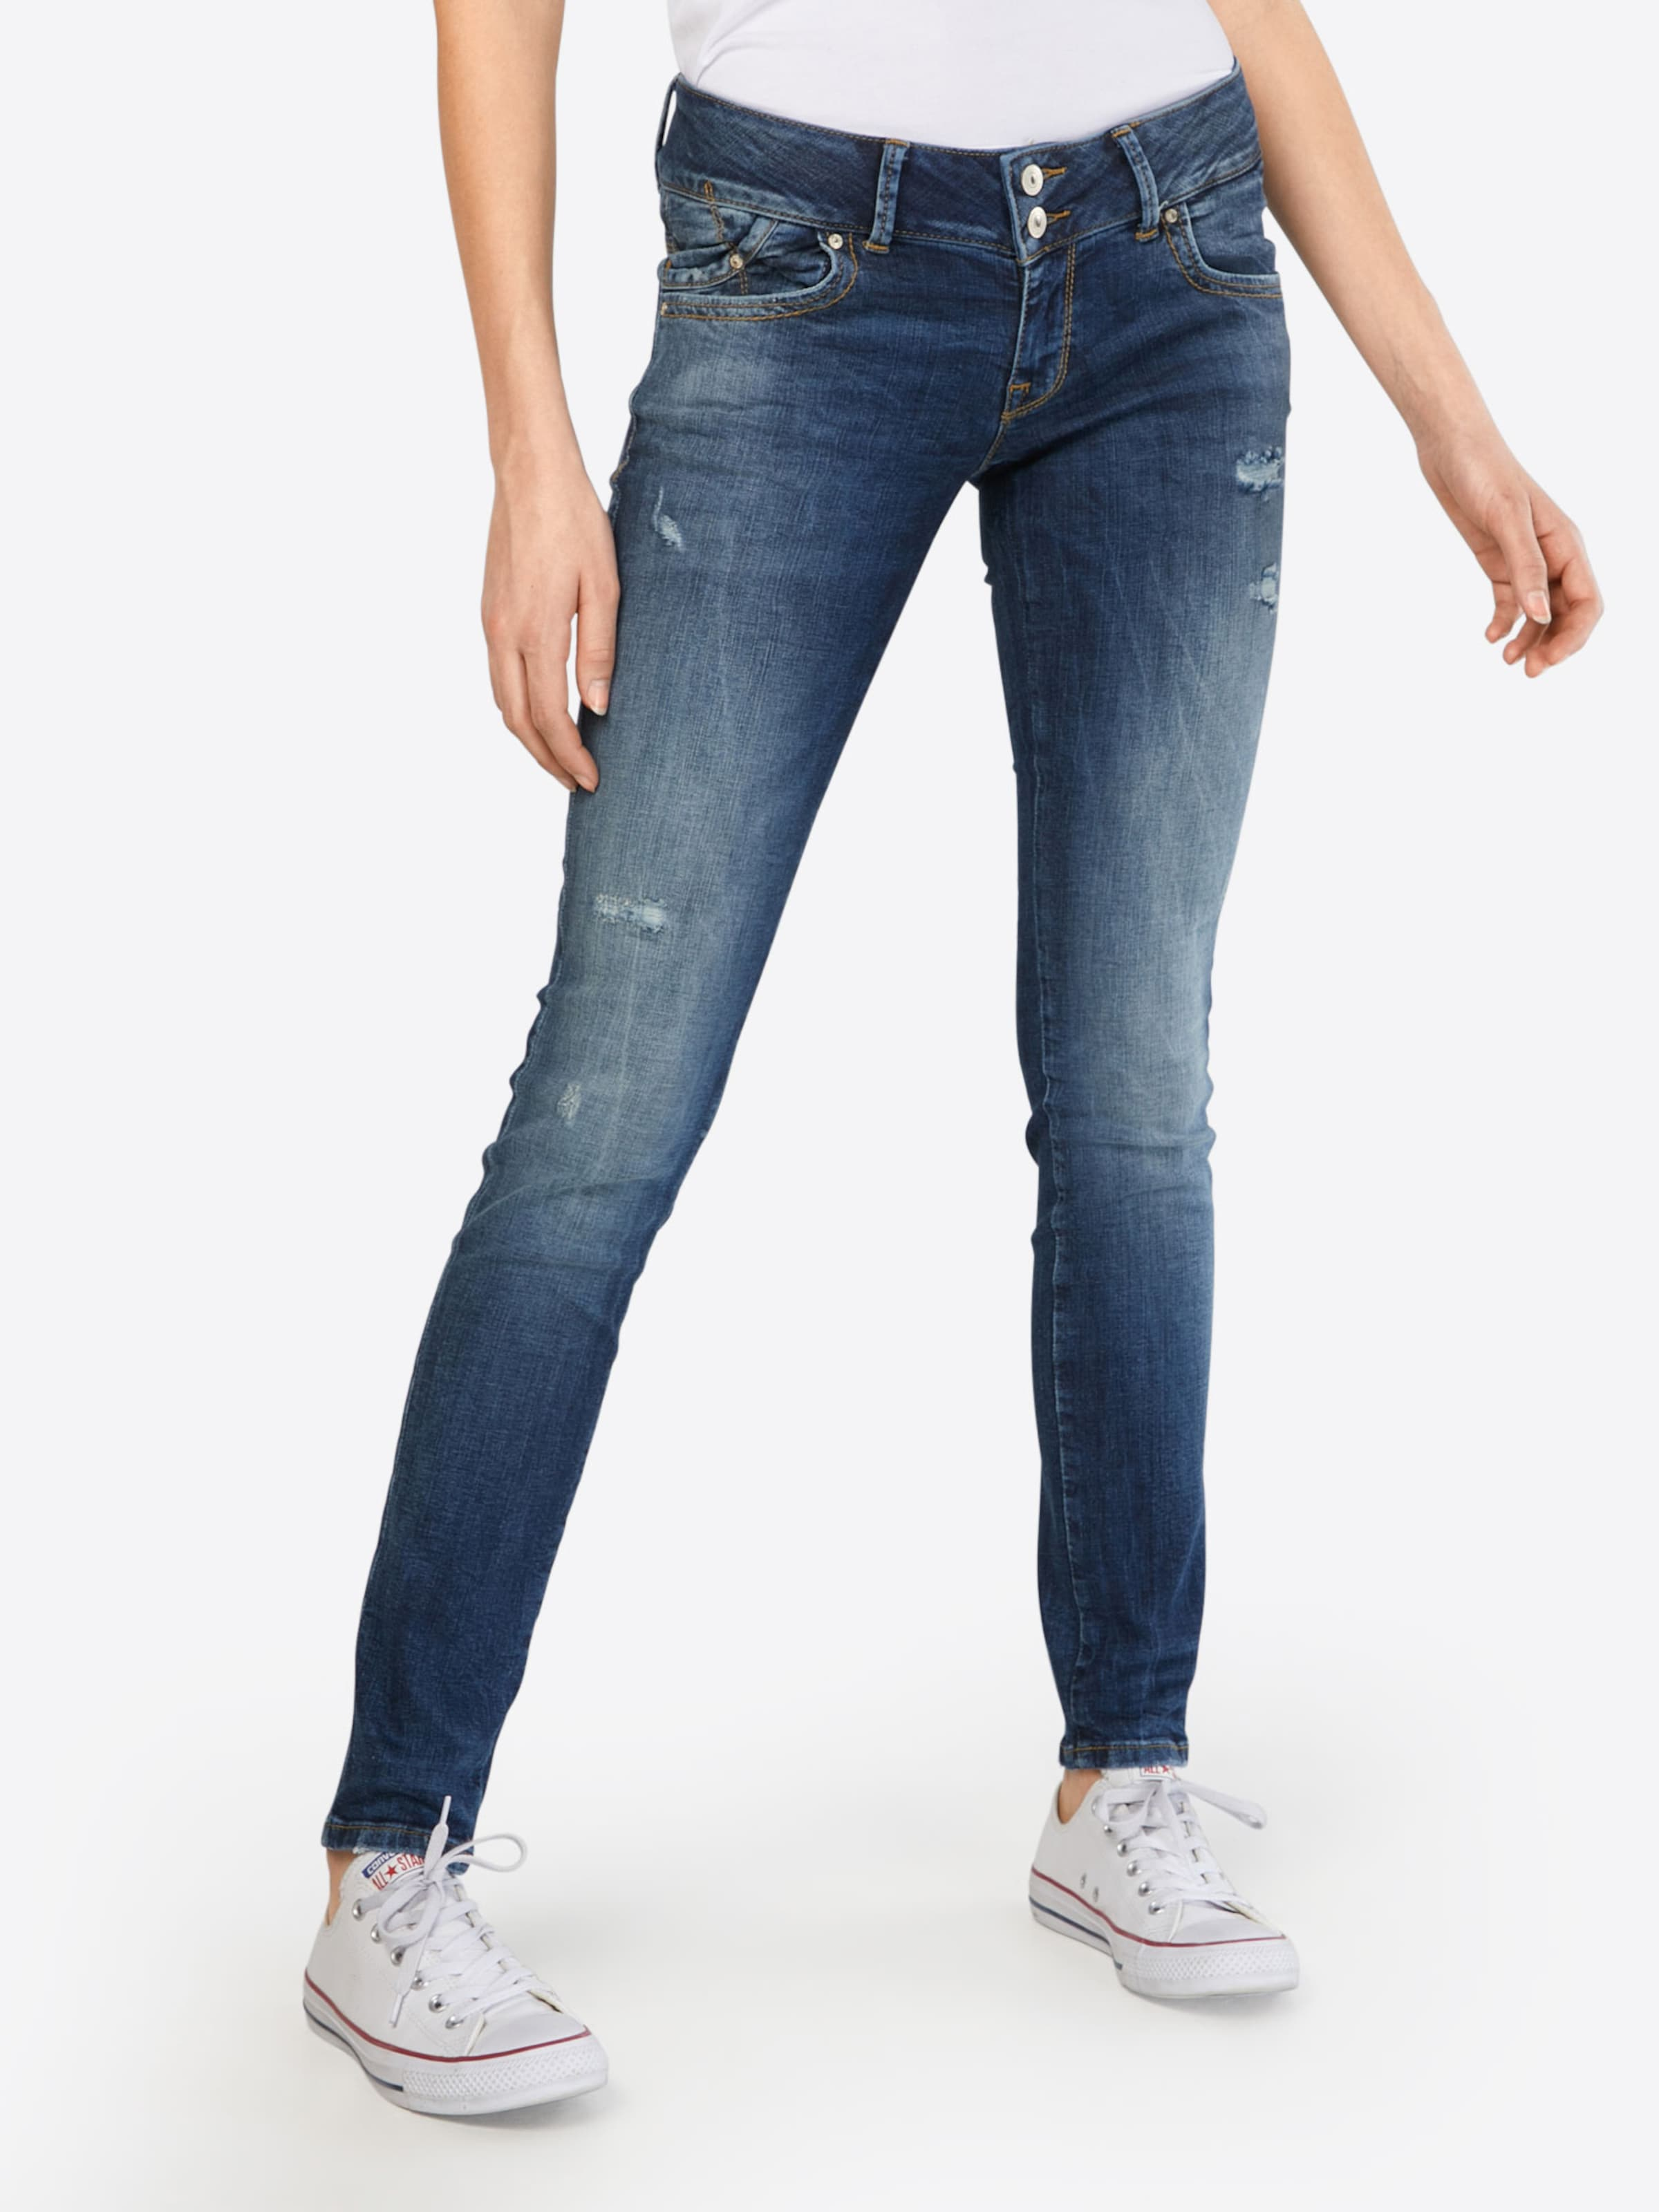 Jeans Ltb Denim Stretchige In Blue Skinny 'molly' 0Pnkw8O